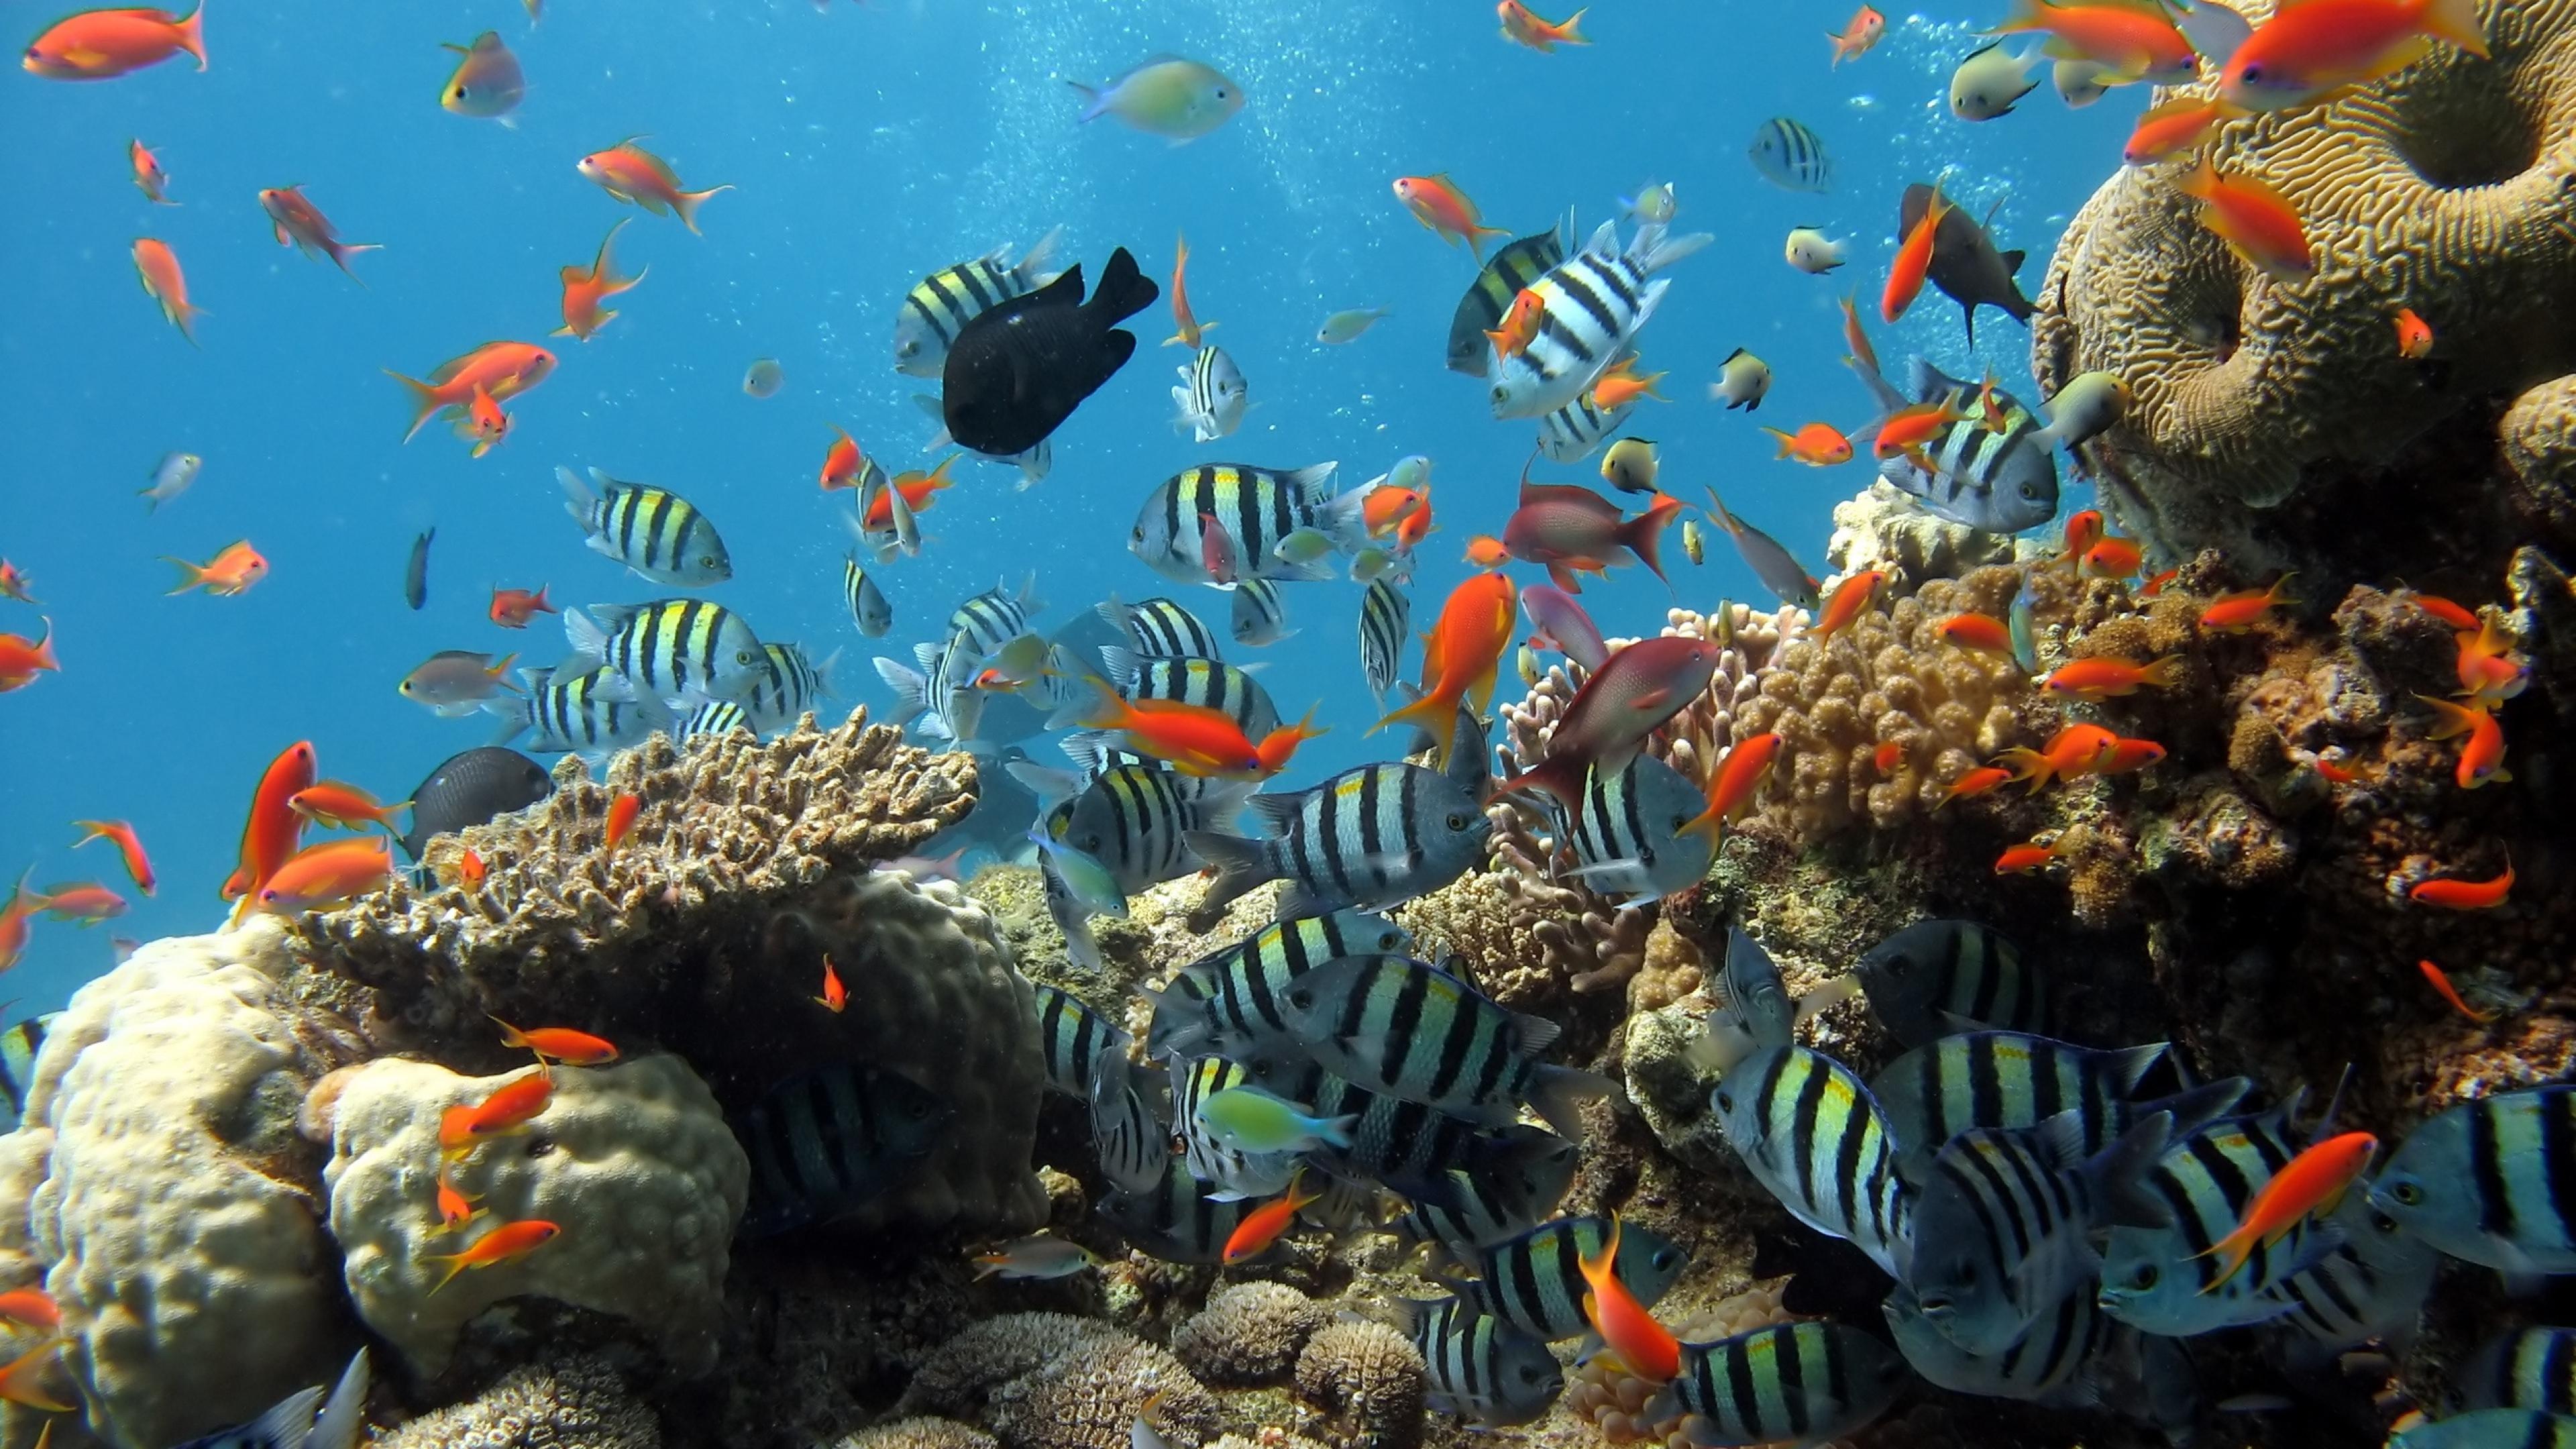 Wallpaper 3840x2160 Underwater Ocean Fish 4K Ultra HD HD Background 3840x2160